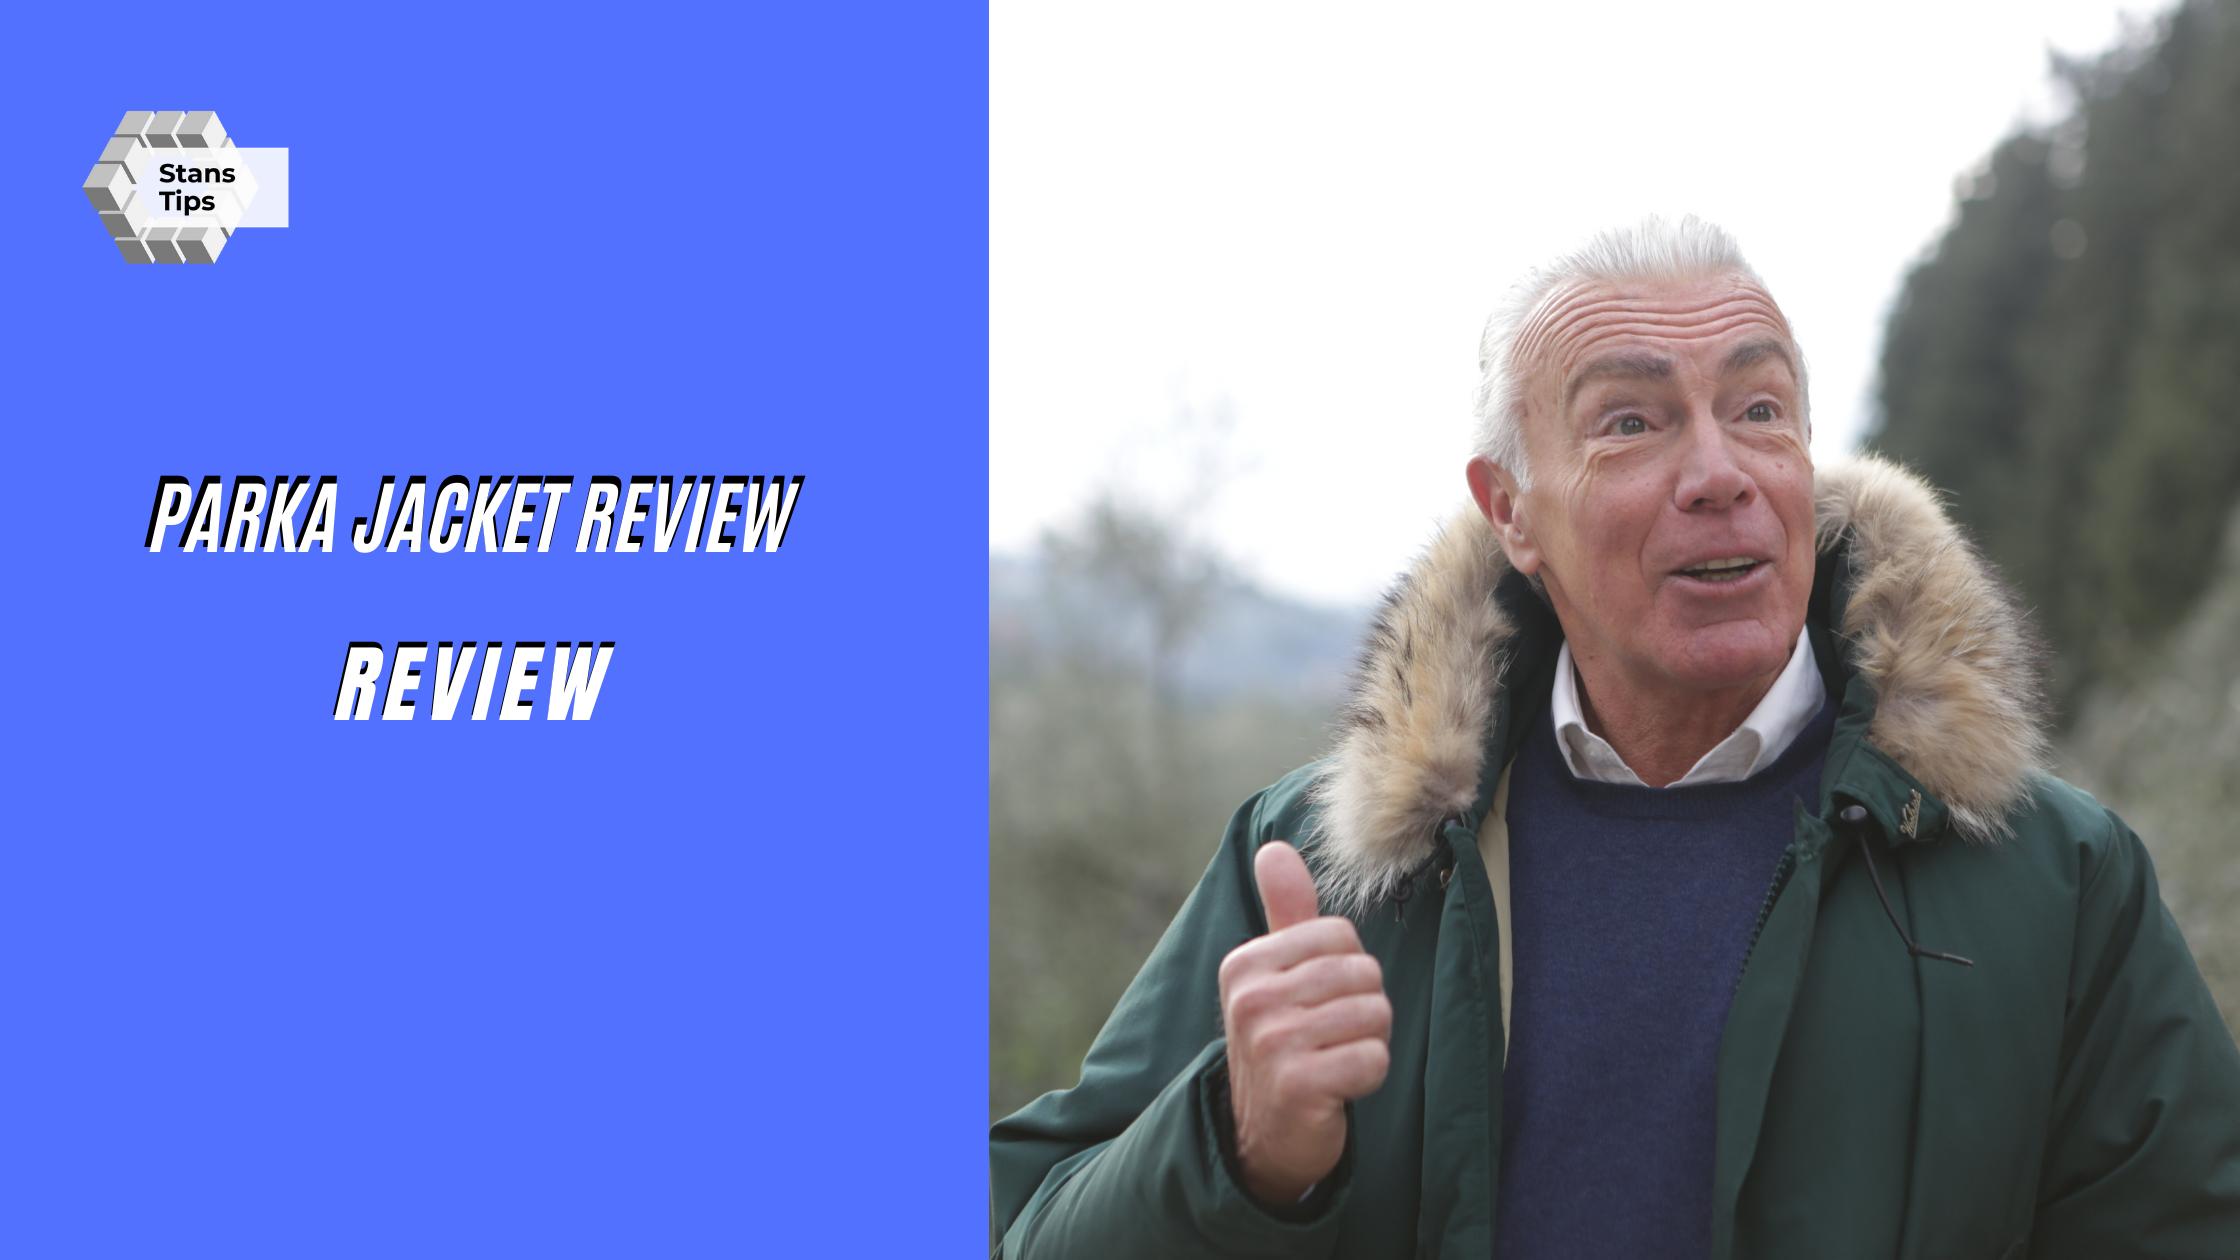 Parka jacket review